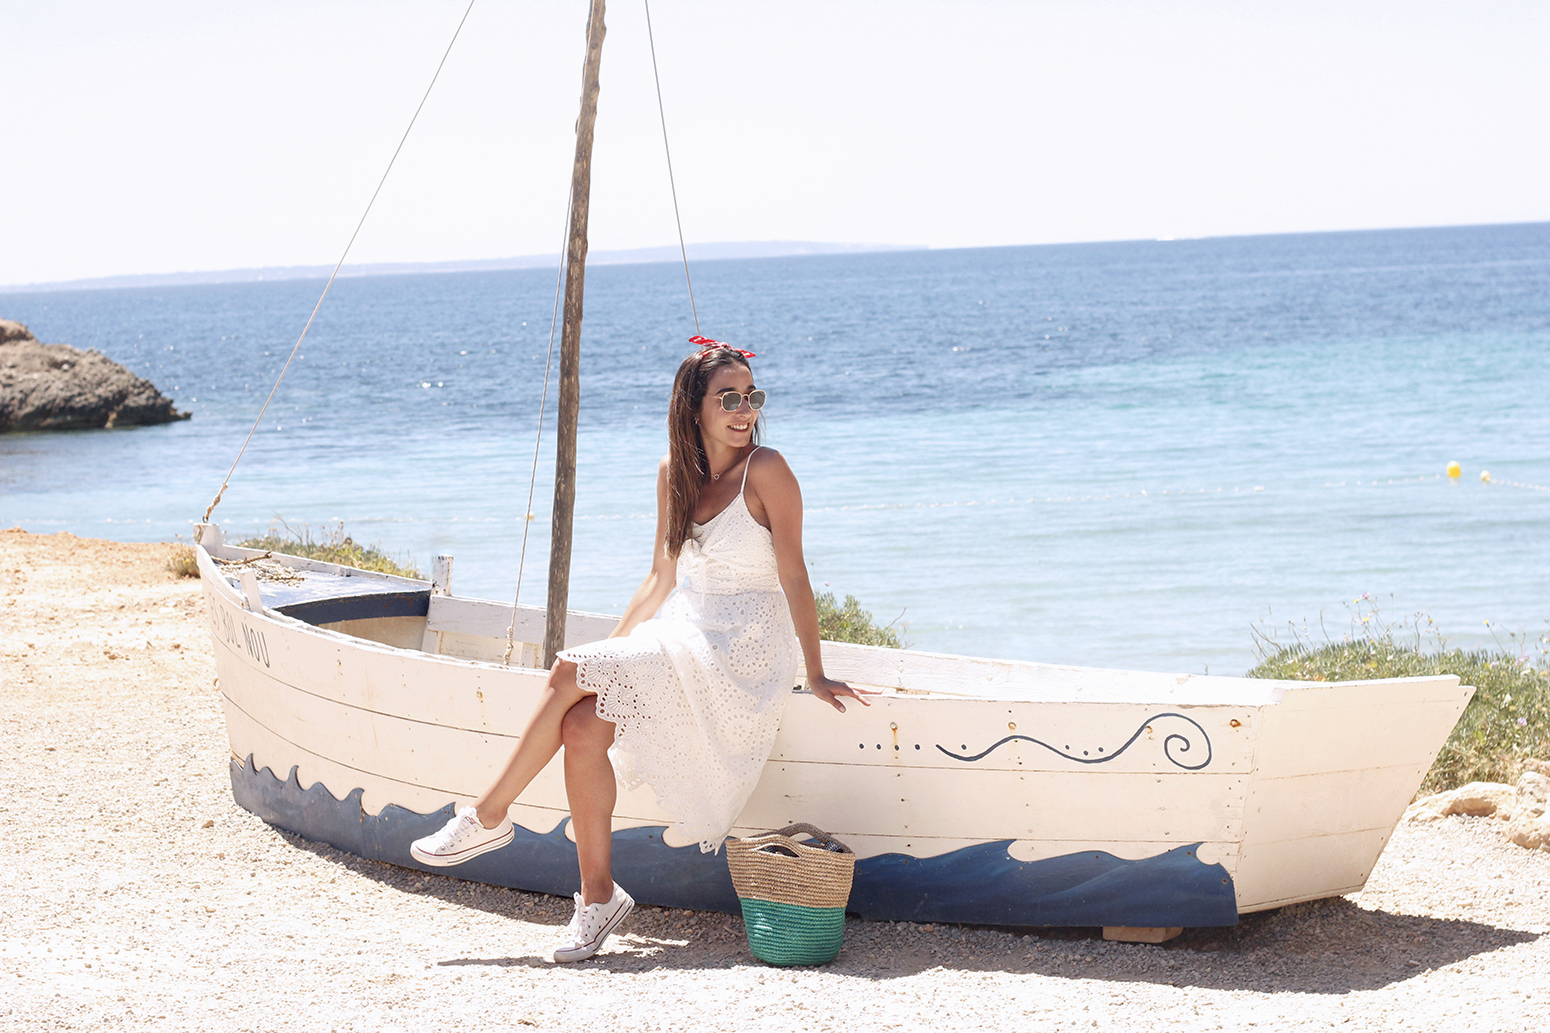 white summer dress white converse rayban sunglasses 2019 street style outfit vacation ibiza7